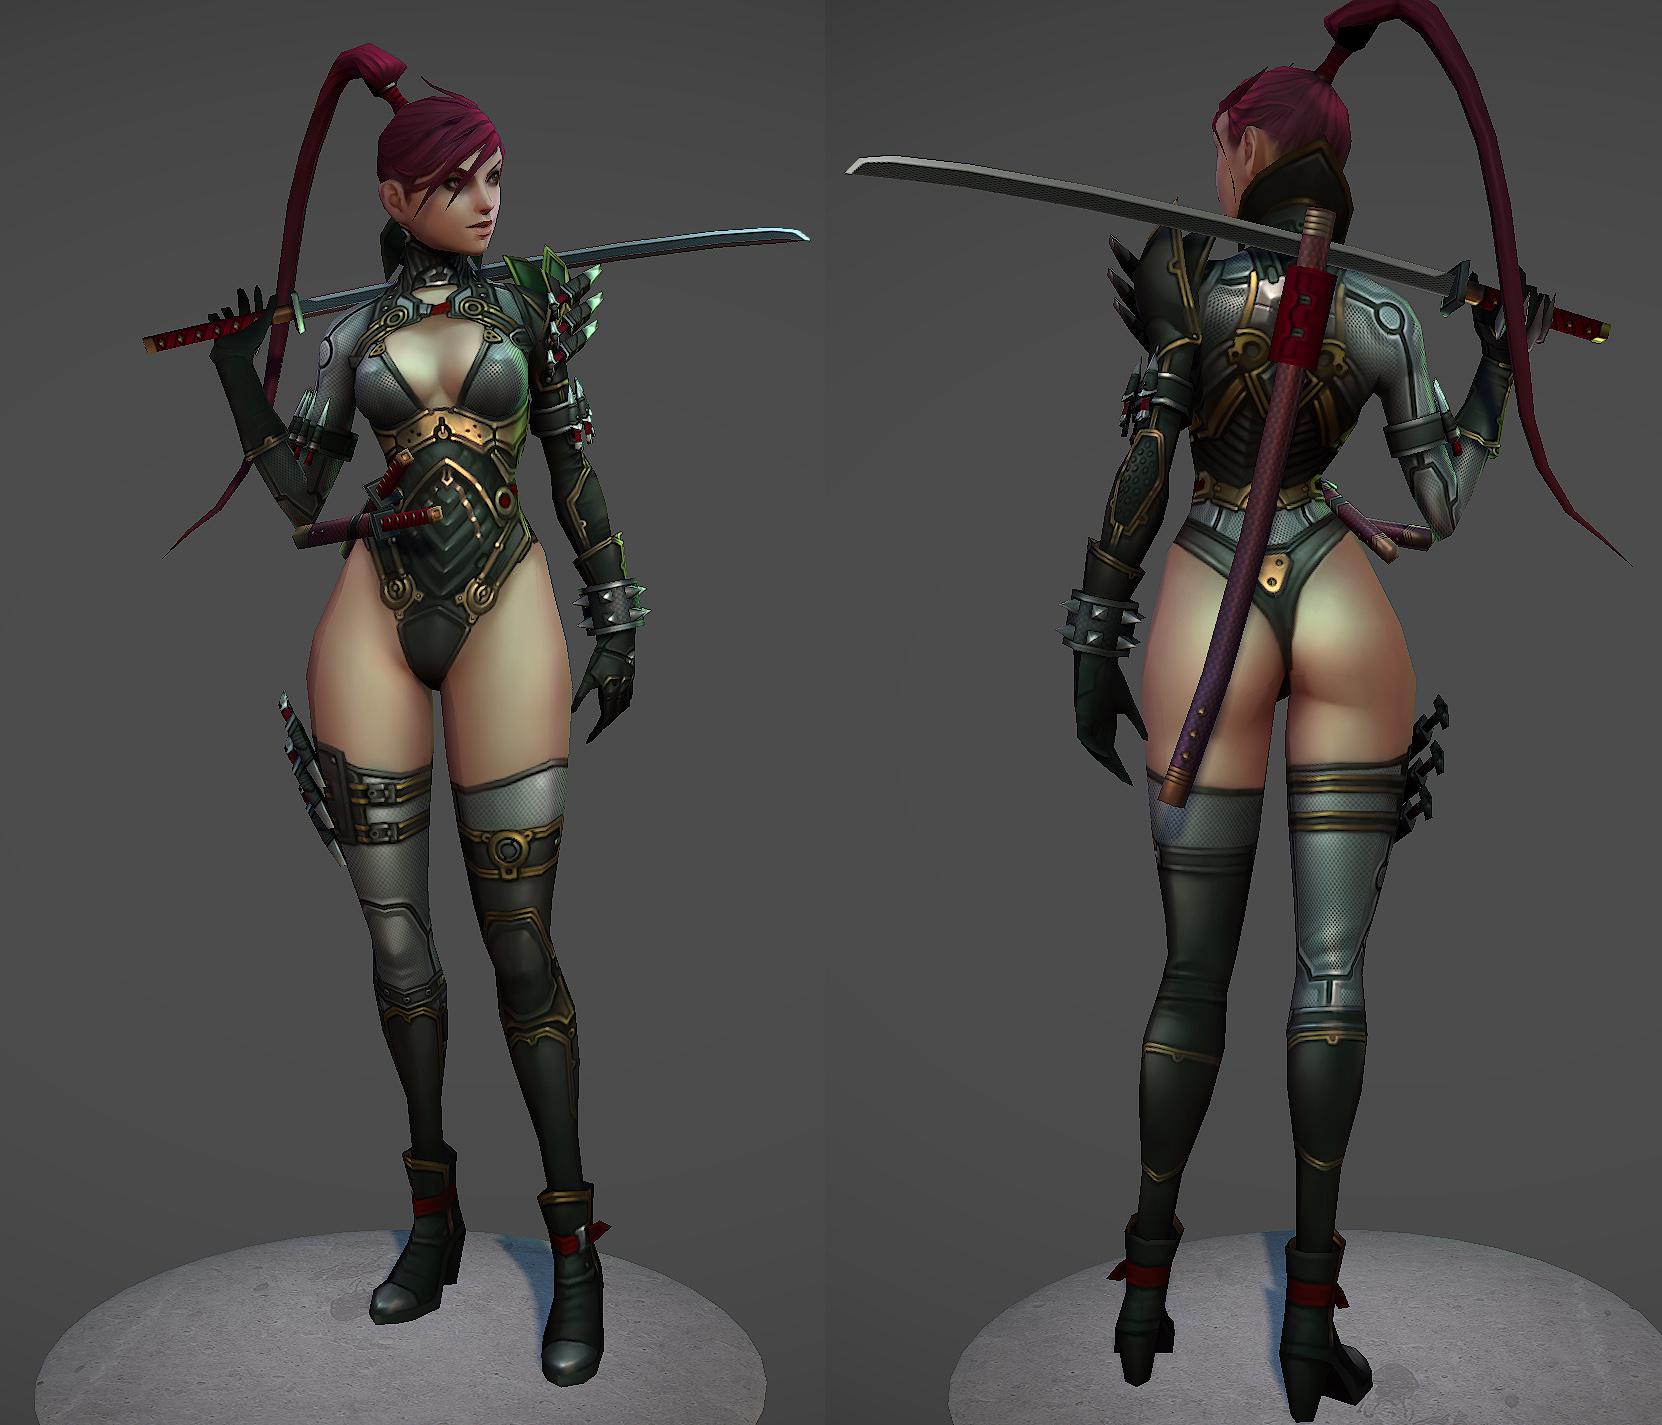 Ninja booty by slipgatecentral